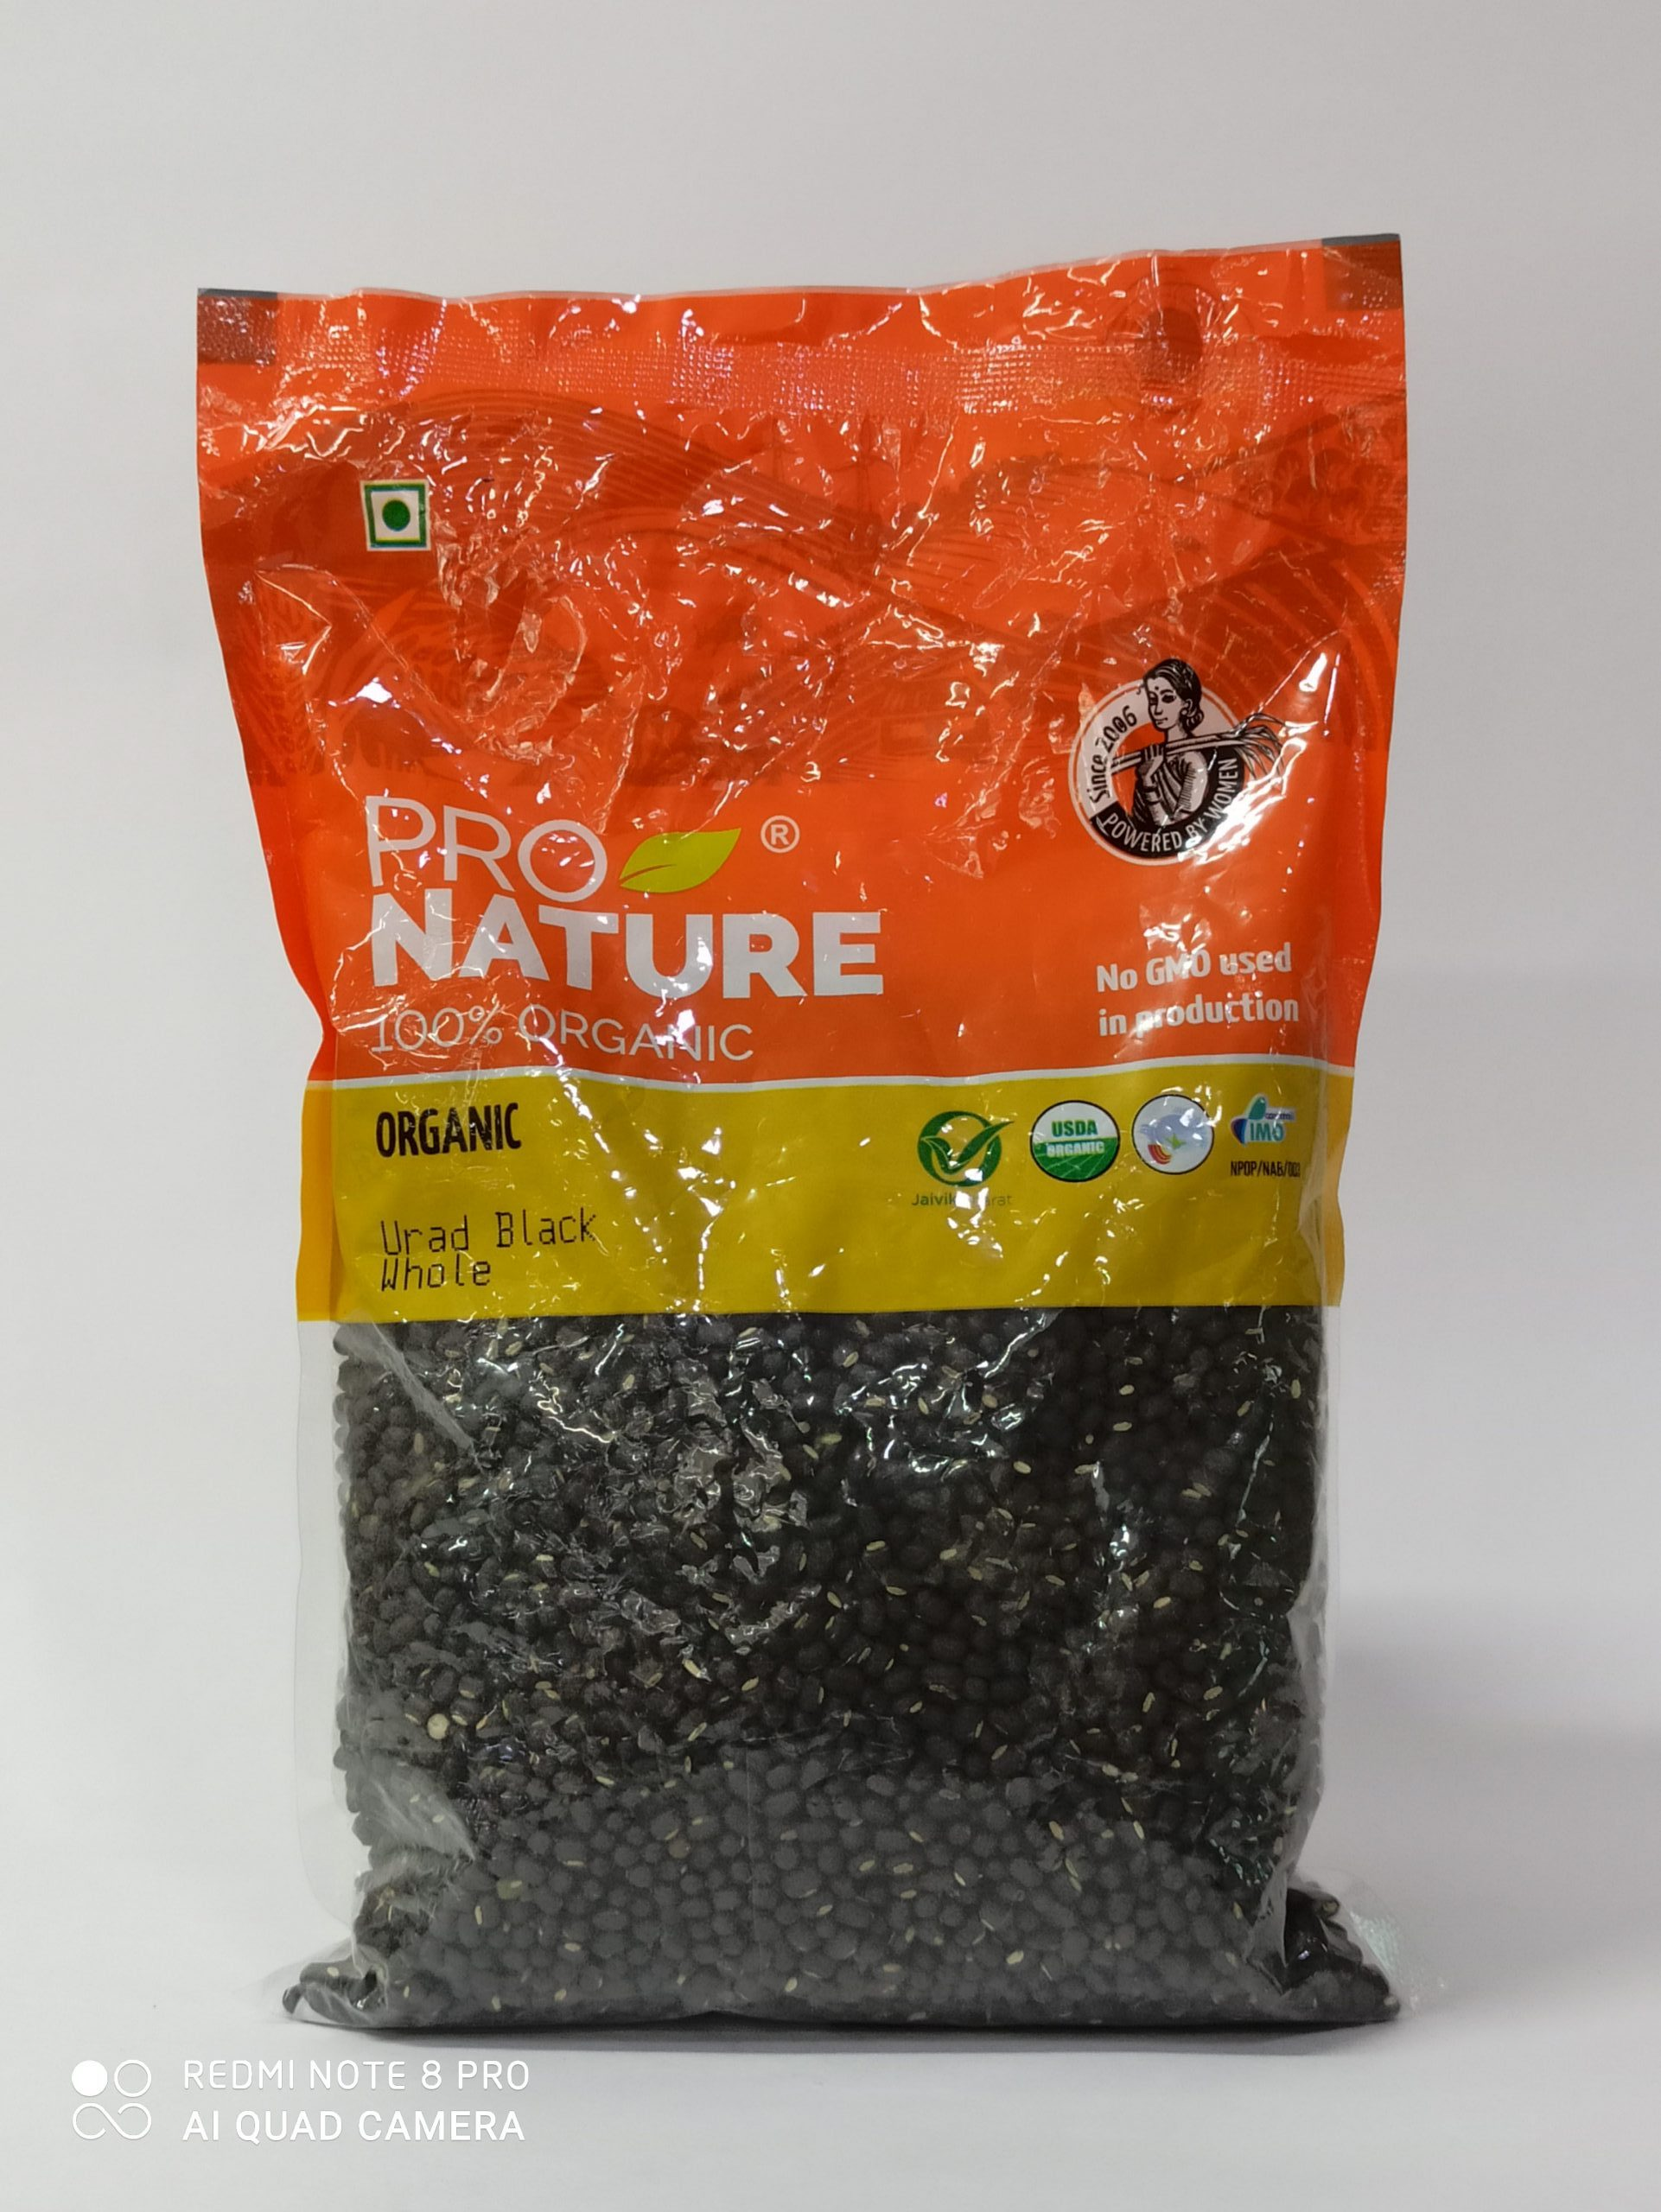 PRO NATURE URAD BLACK WHOLE 500GM